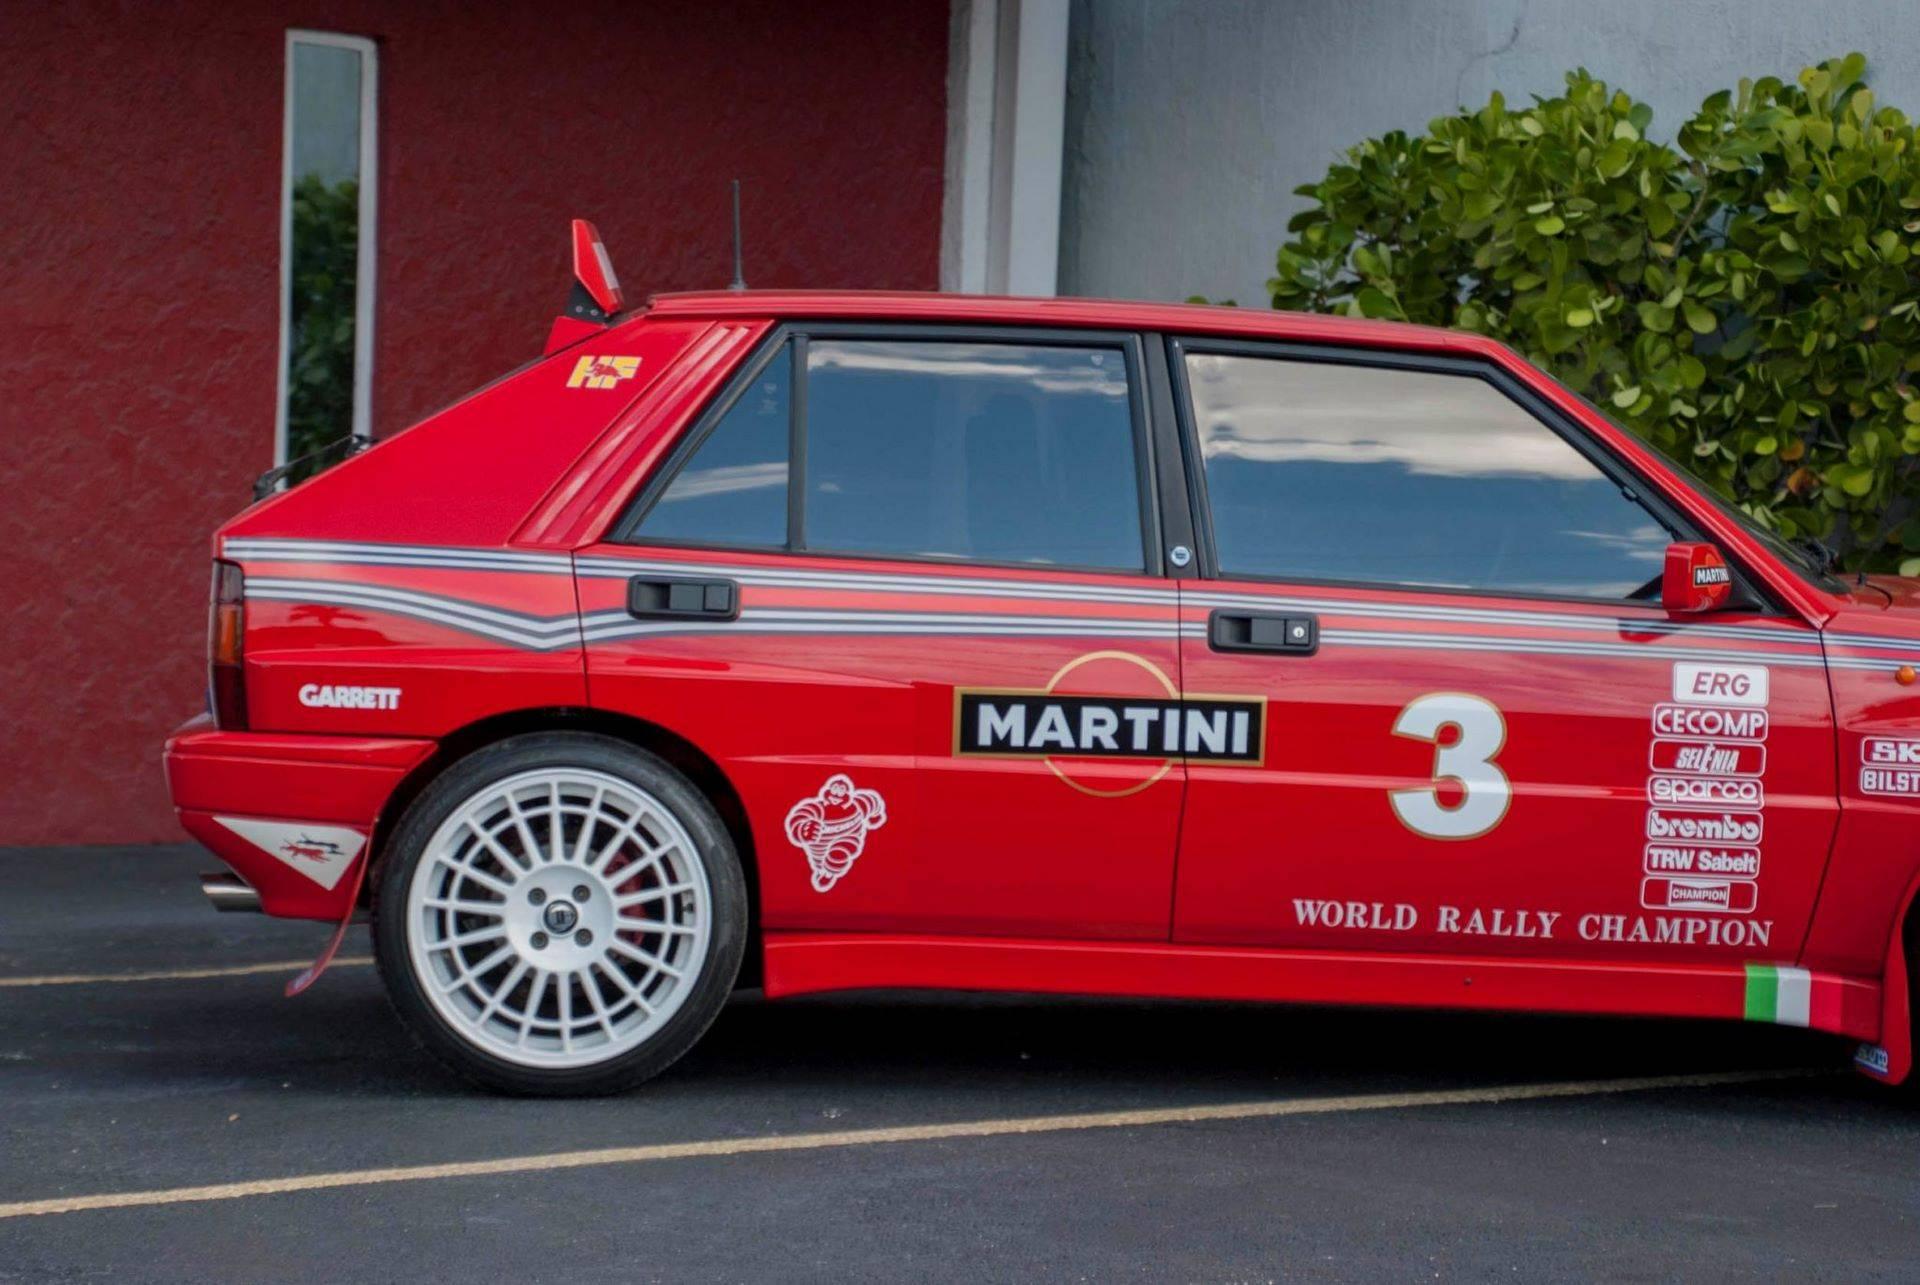 Lancia-Delta-Integrale-8V-1989-61